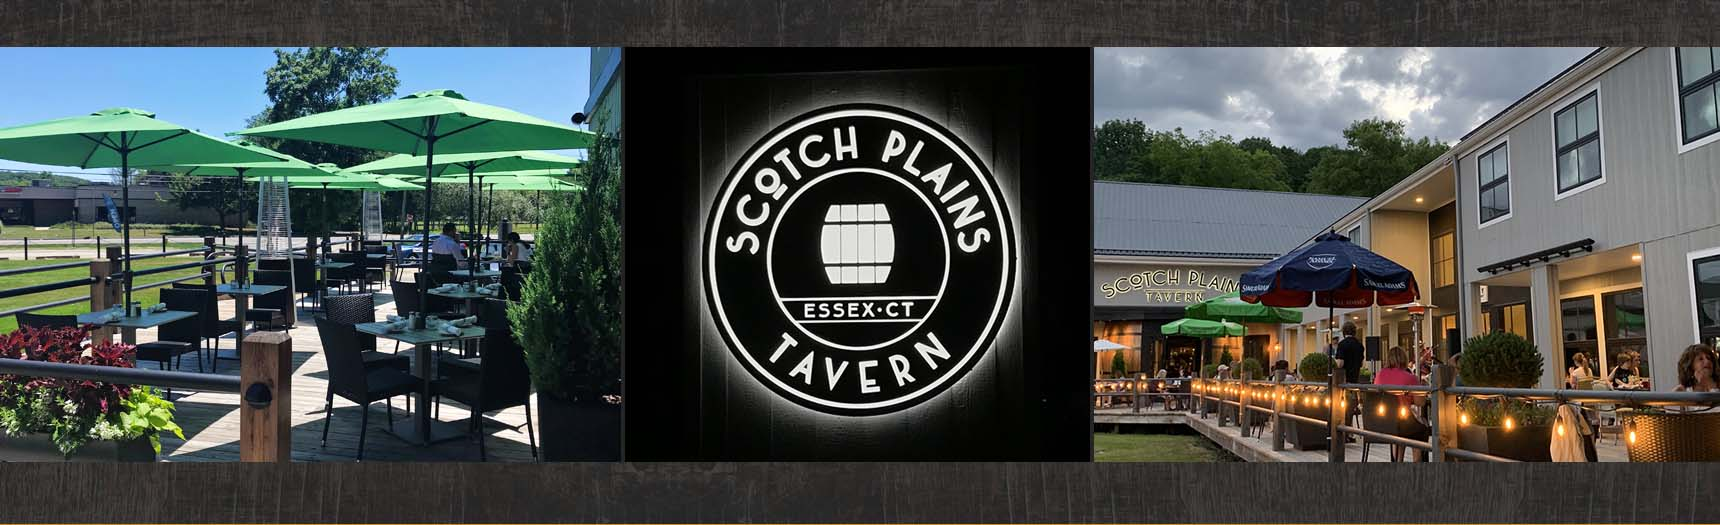 Scotch Plains Tavern Contact Us image